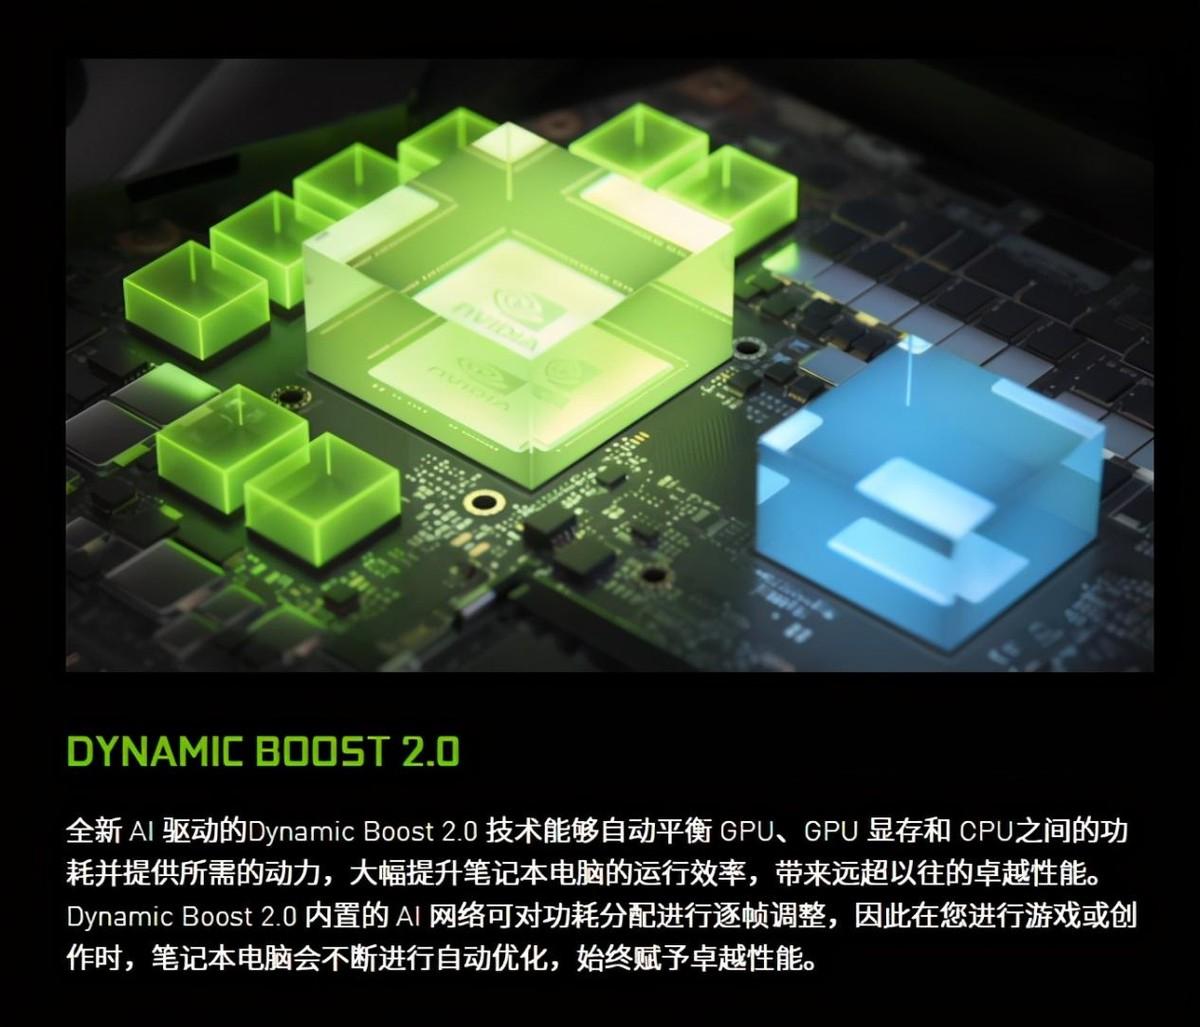 战神G8-TA7NP:仅8K多,十一代i7+RTX3060+17.3寸144Hz屏